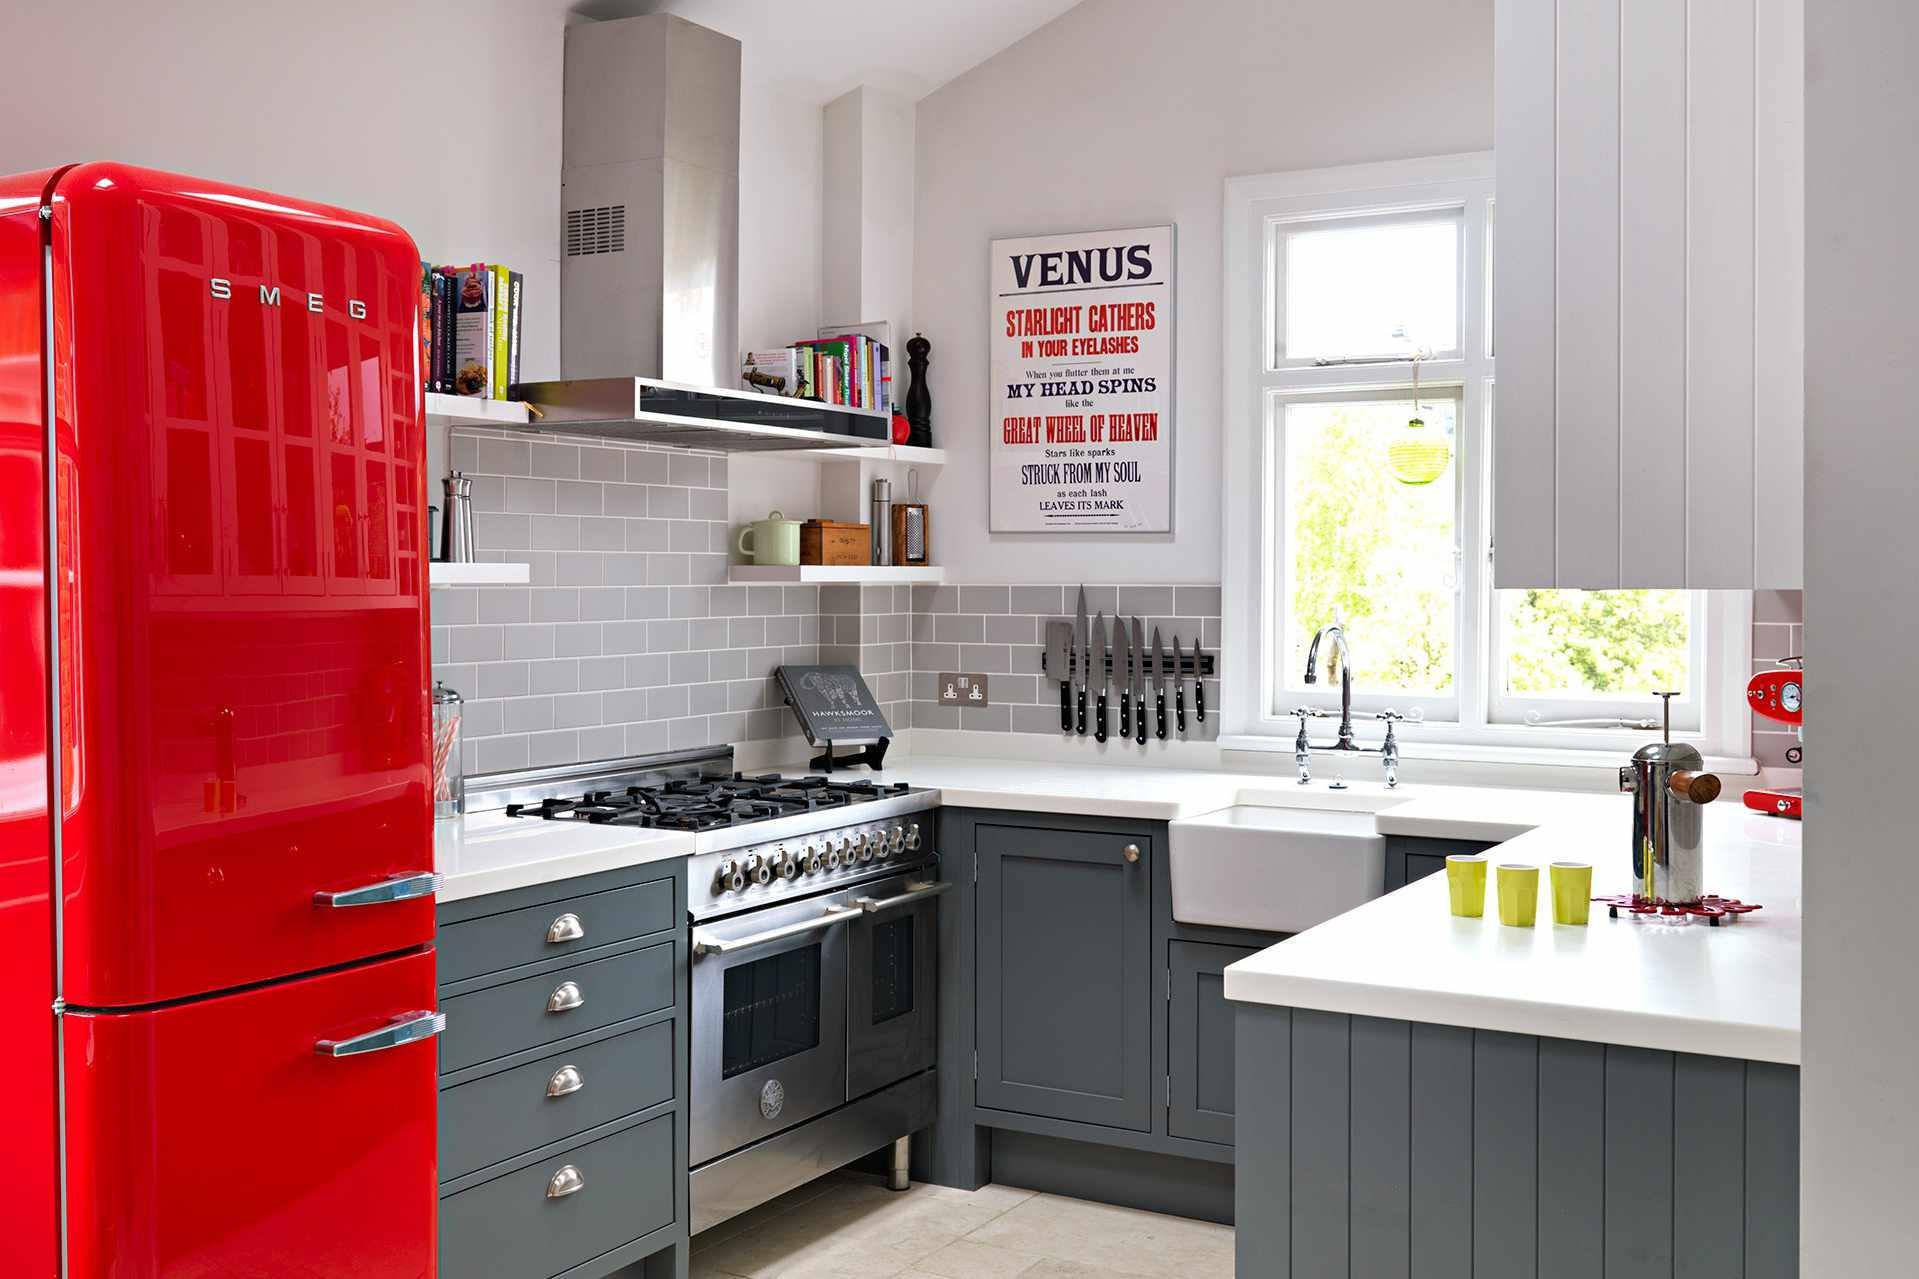 kitchen with red fridge